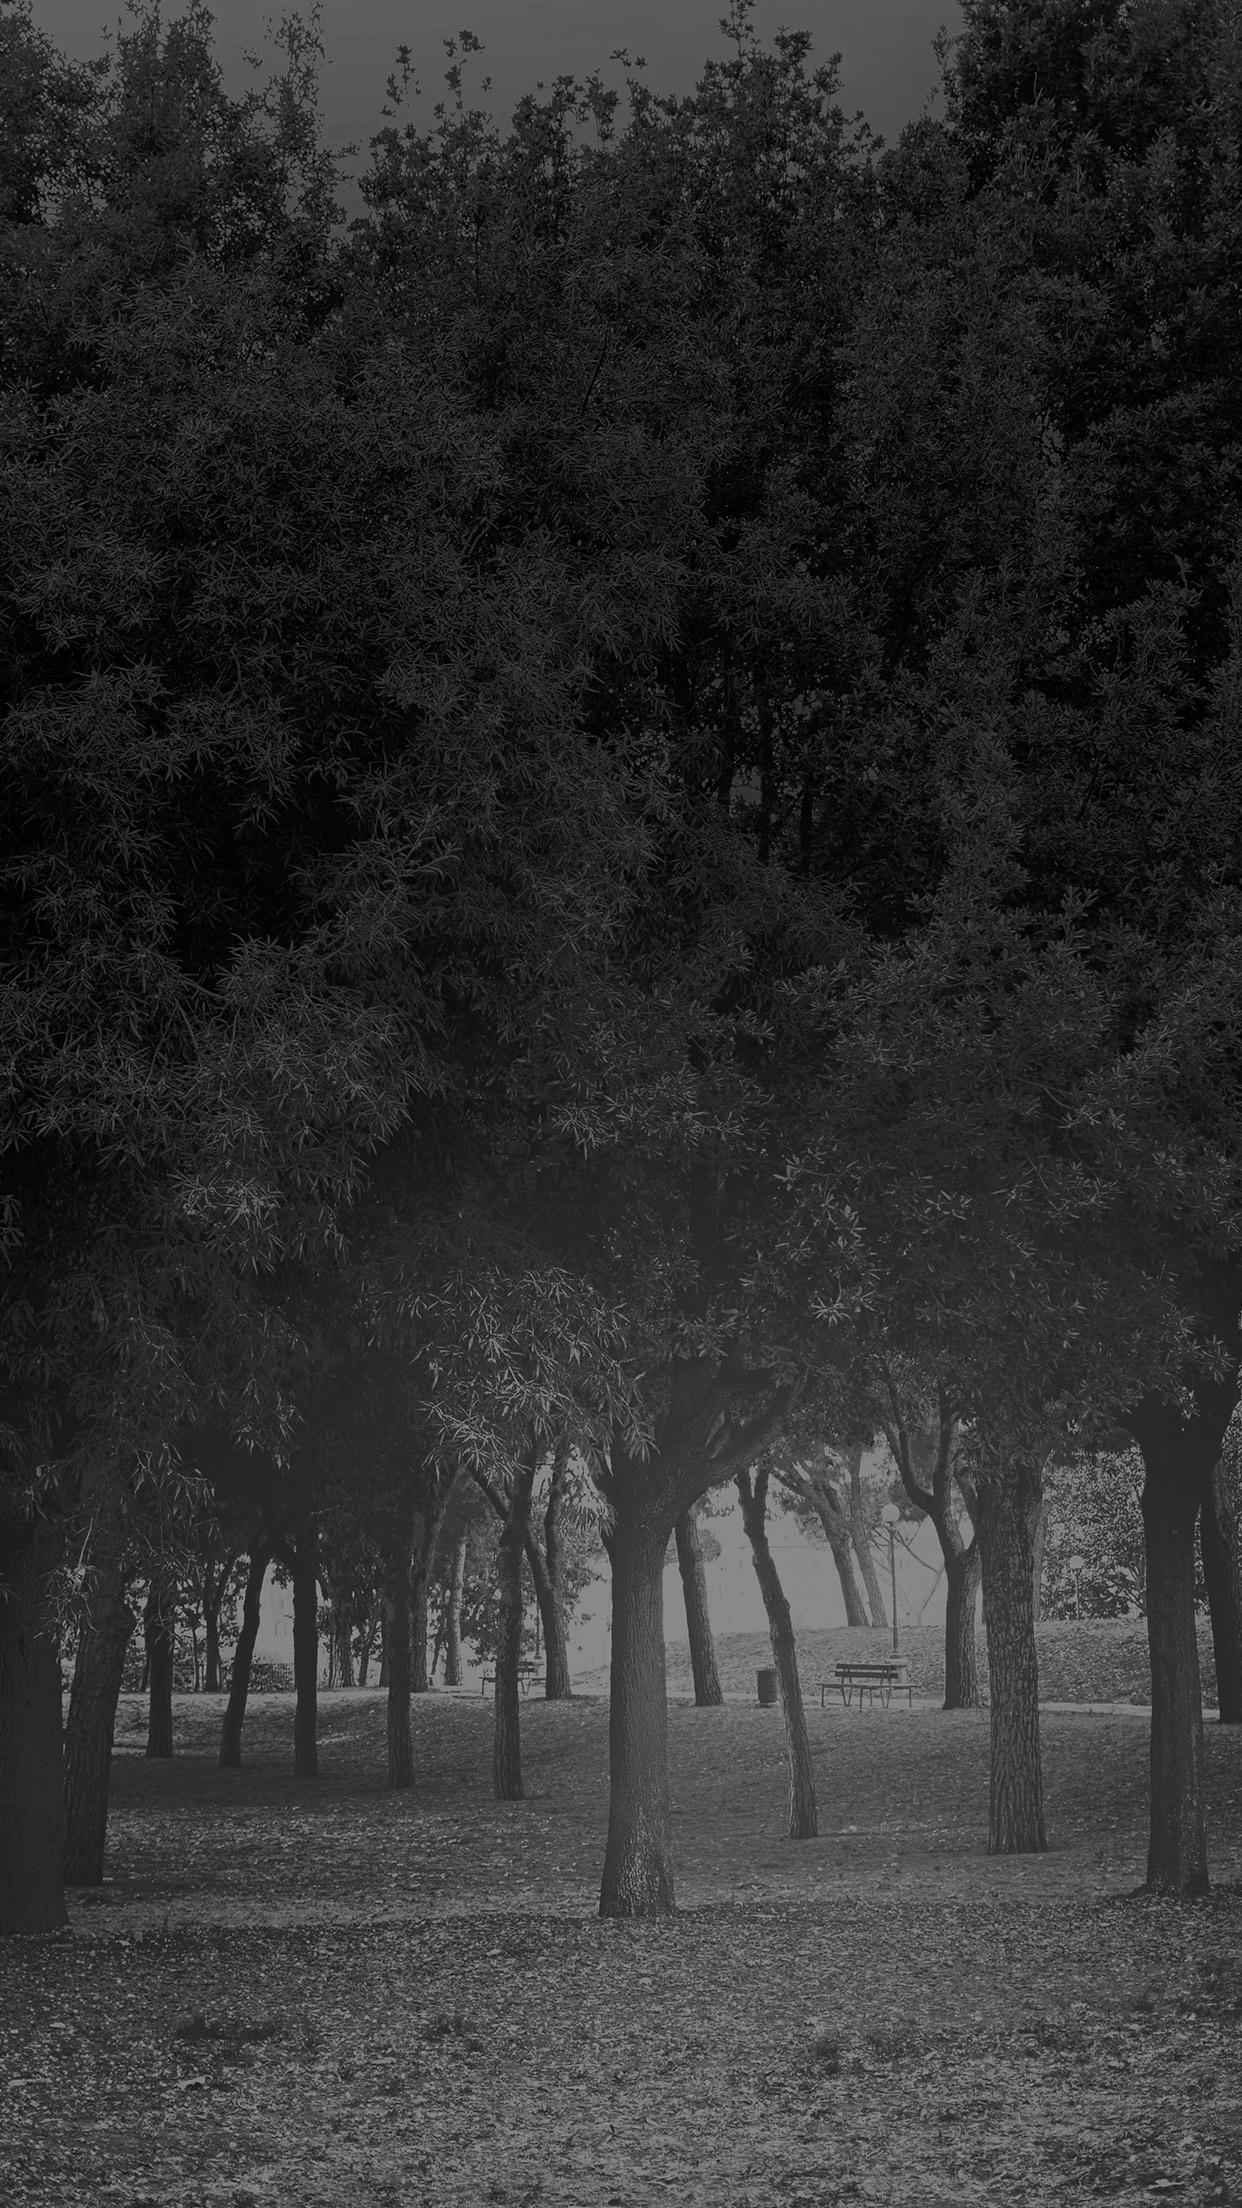 I Love Papers | mt14-tree-wood-grass-garden-dark-sun-light-nature-bw for Dark Vs Light Nature  153tgx